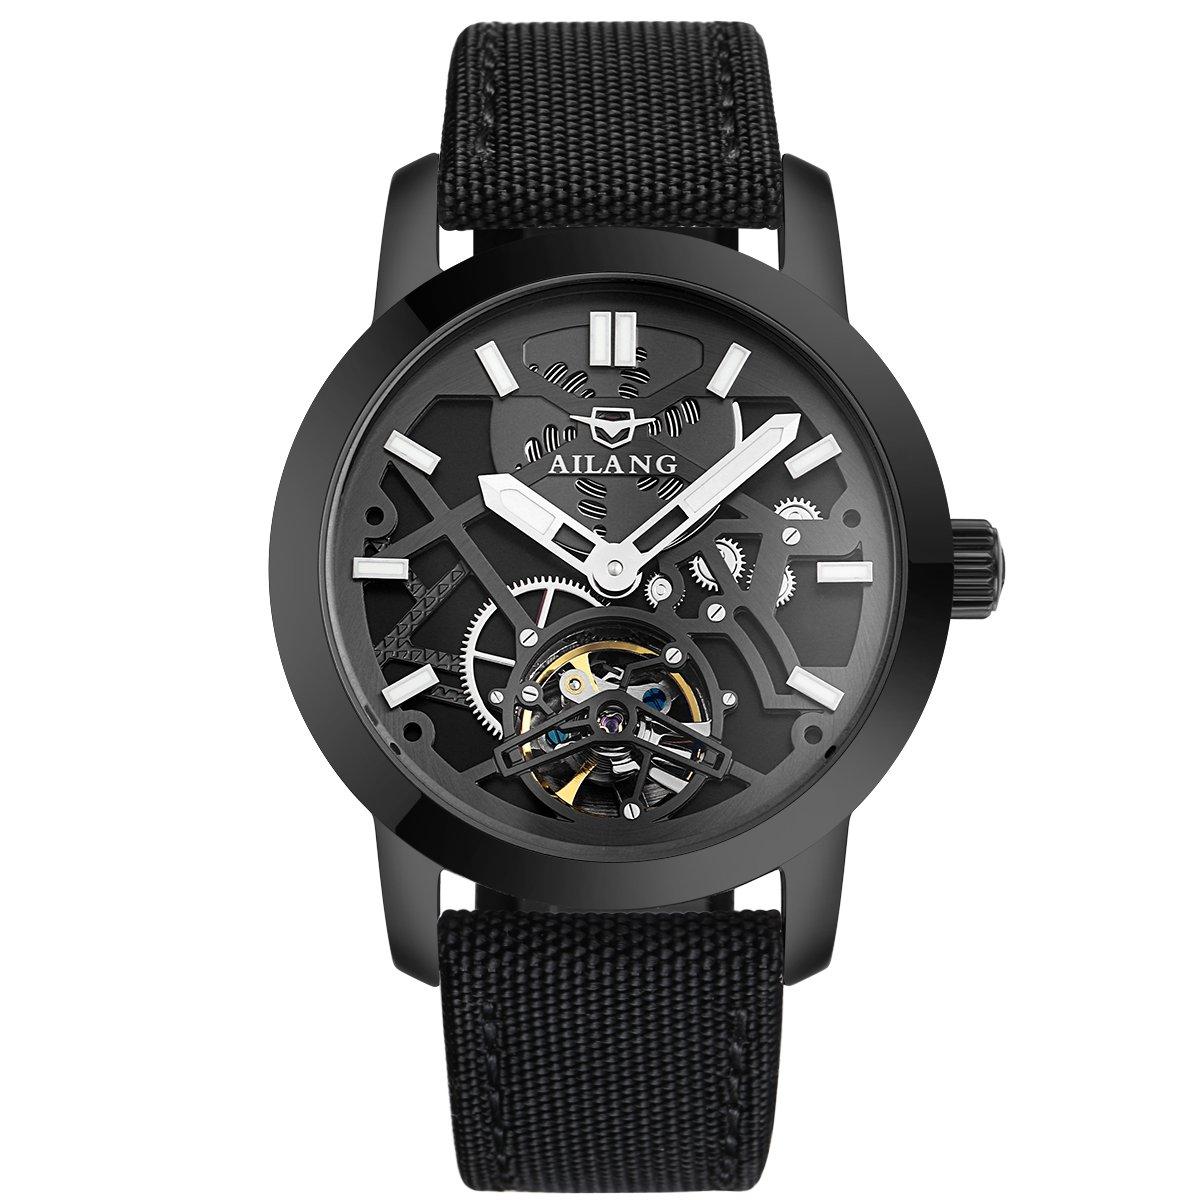 ailang ai6811lメンズスチームパンクブラックスケルトン自動巻き自動機械腕時計 ブラック B071VH7D3Y ブラック ブラック